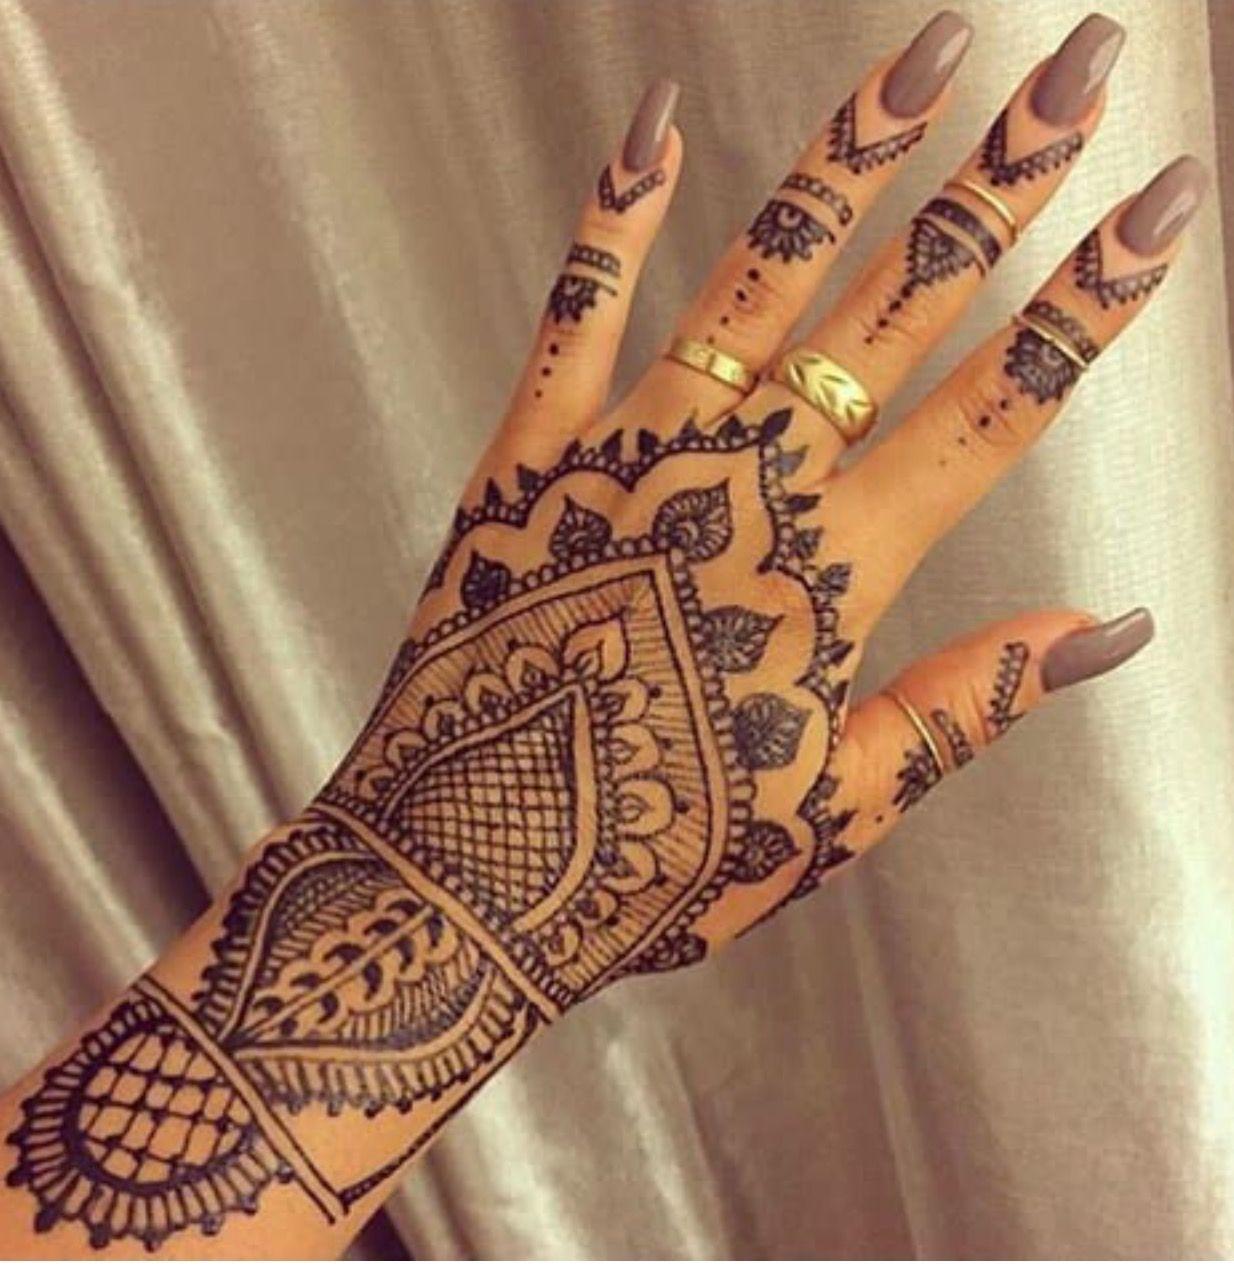 Henna tattoo nails and rings ✨Pinterest:Naturalb3auty✨